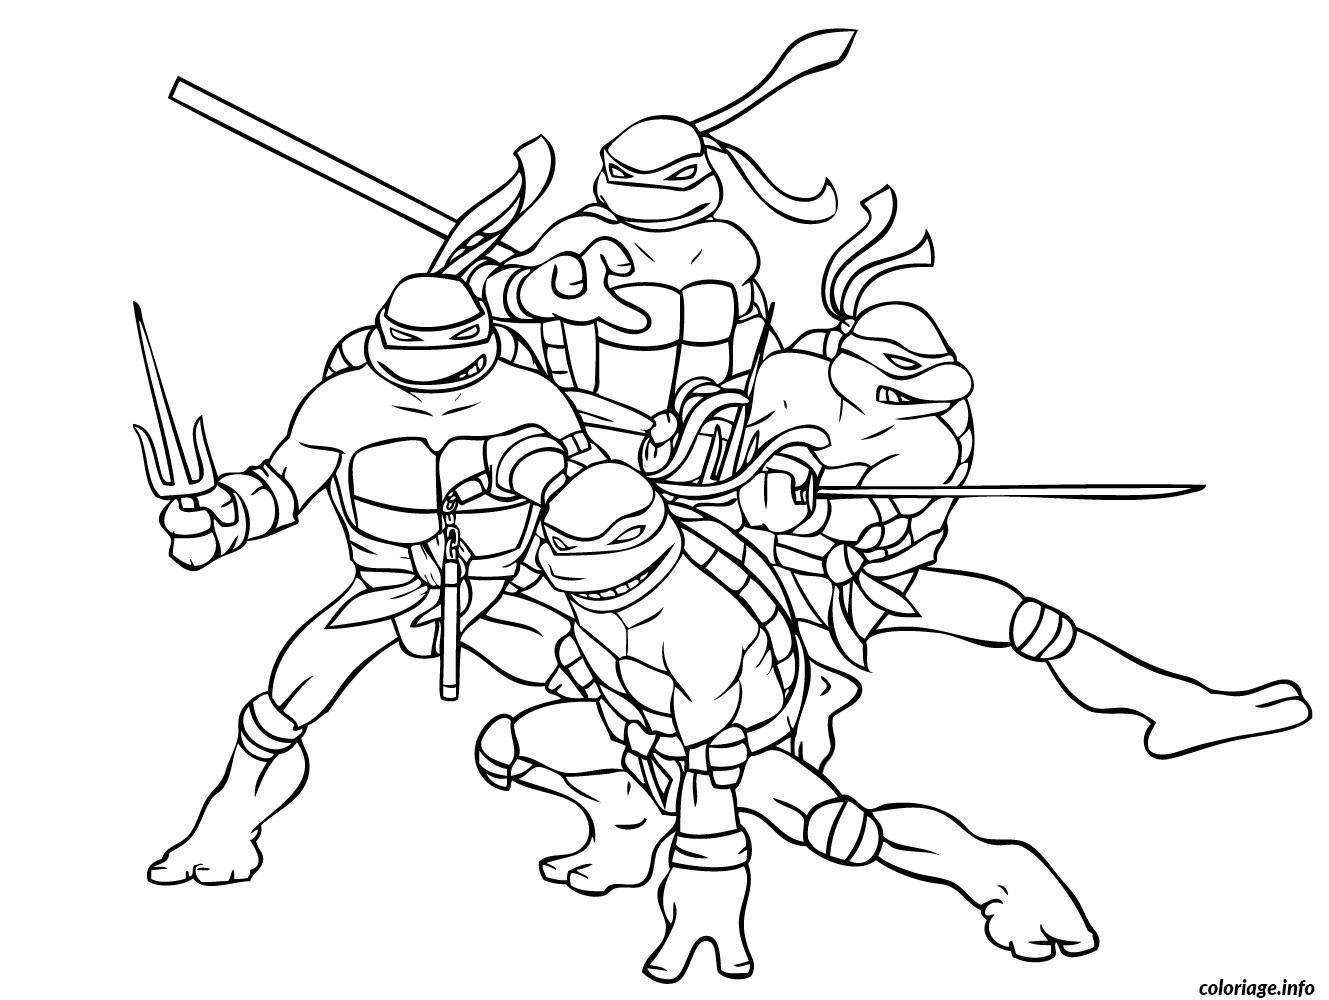 Coloriage tortue ninja 6 dessin - Tortue en dessin ...